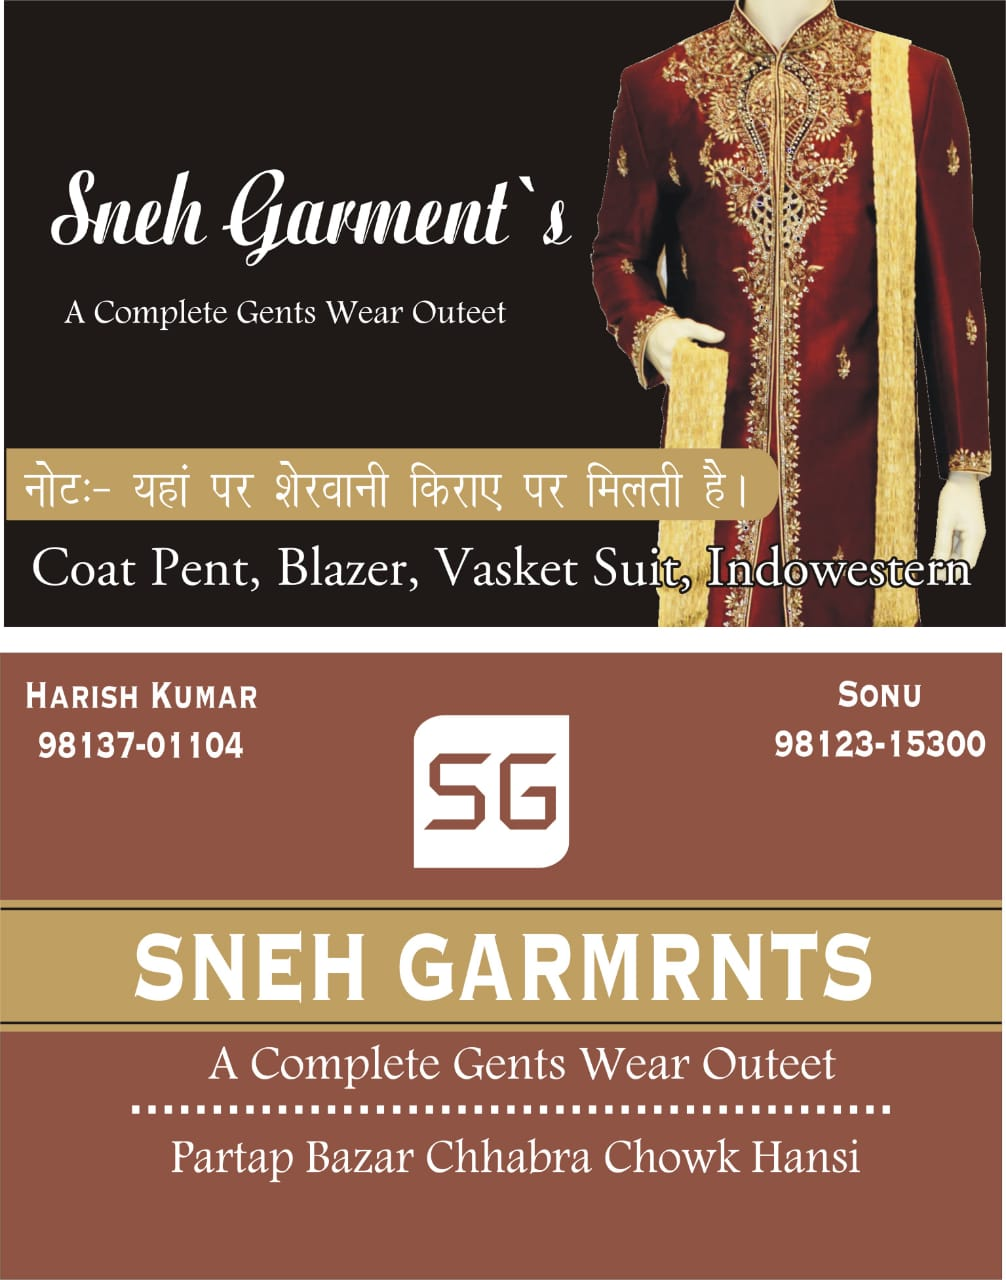 Sneh Garment's